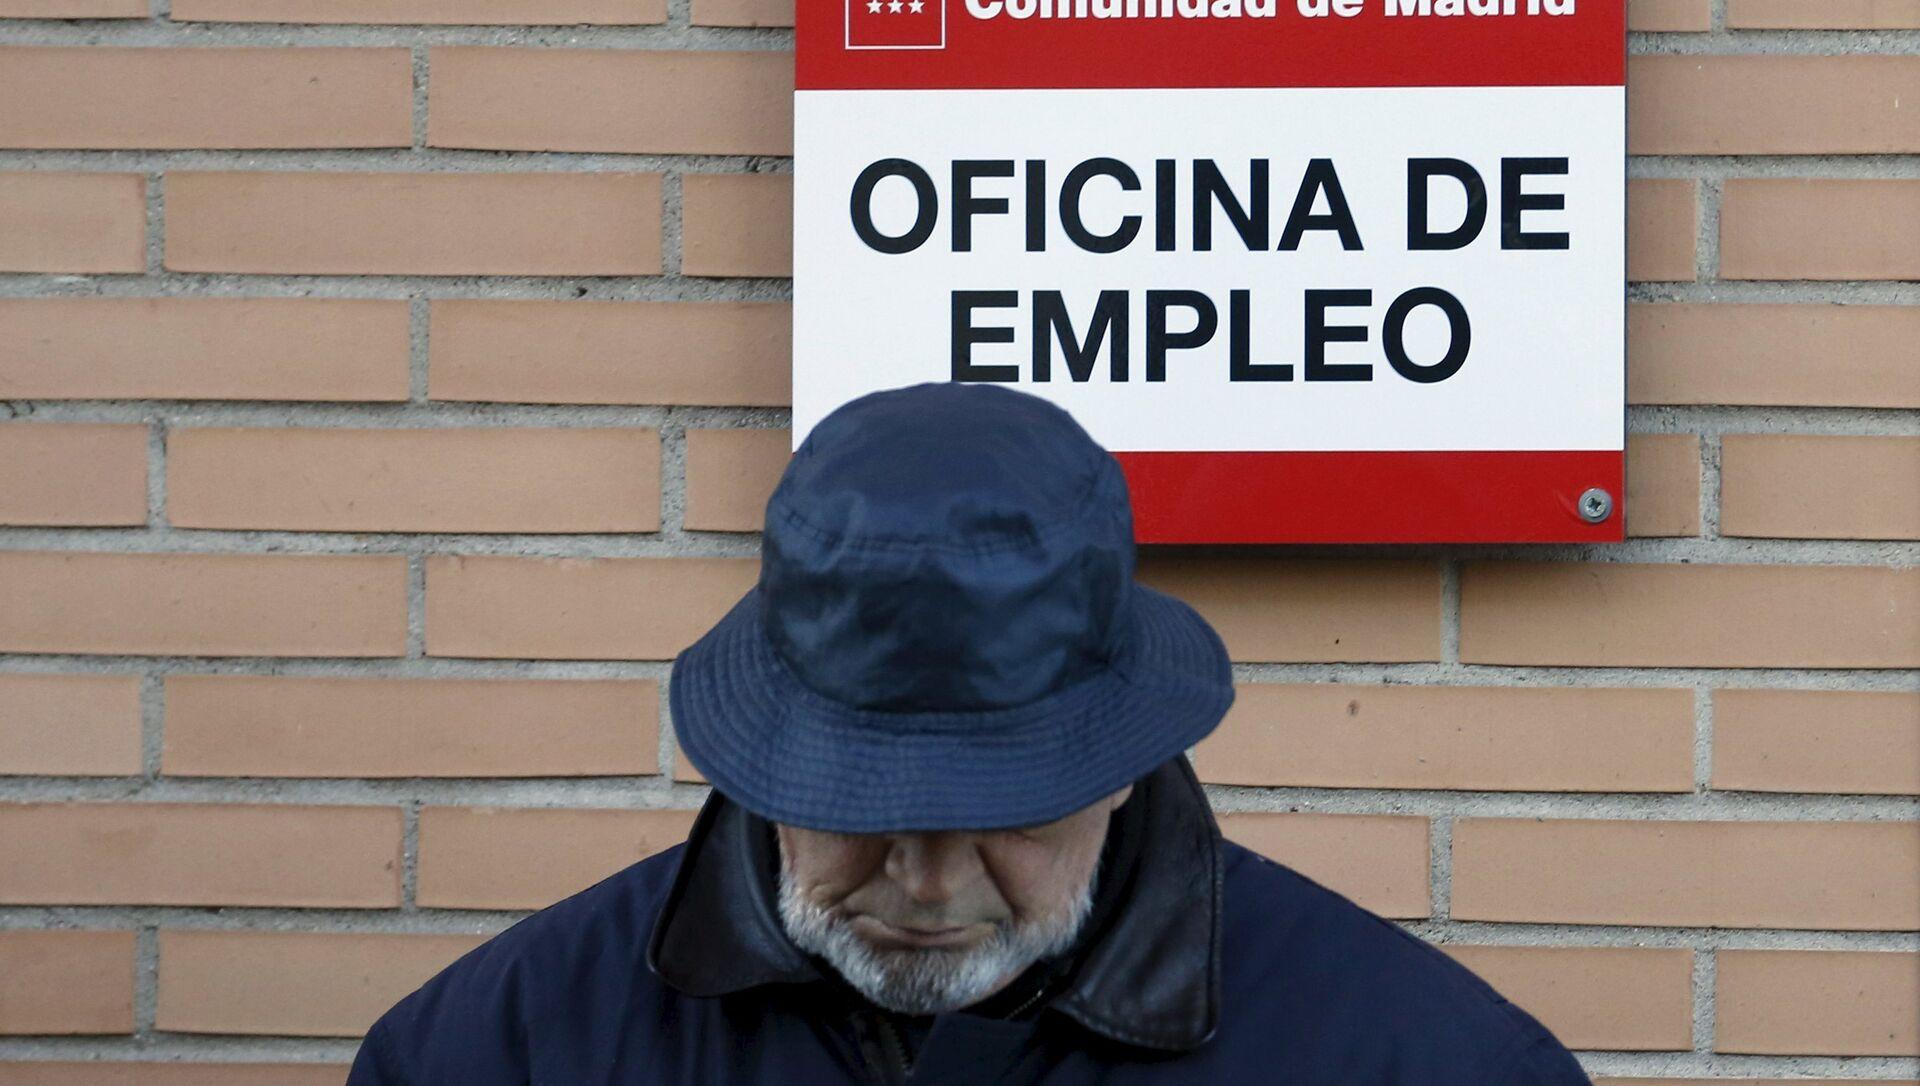 Un hombre cerca de la oficina de empleo en Madrid, España - Sputnik Mundo, 1920, 01.05.2020